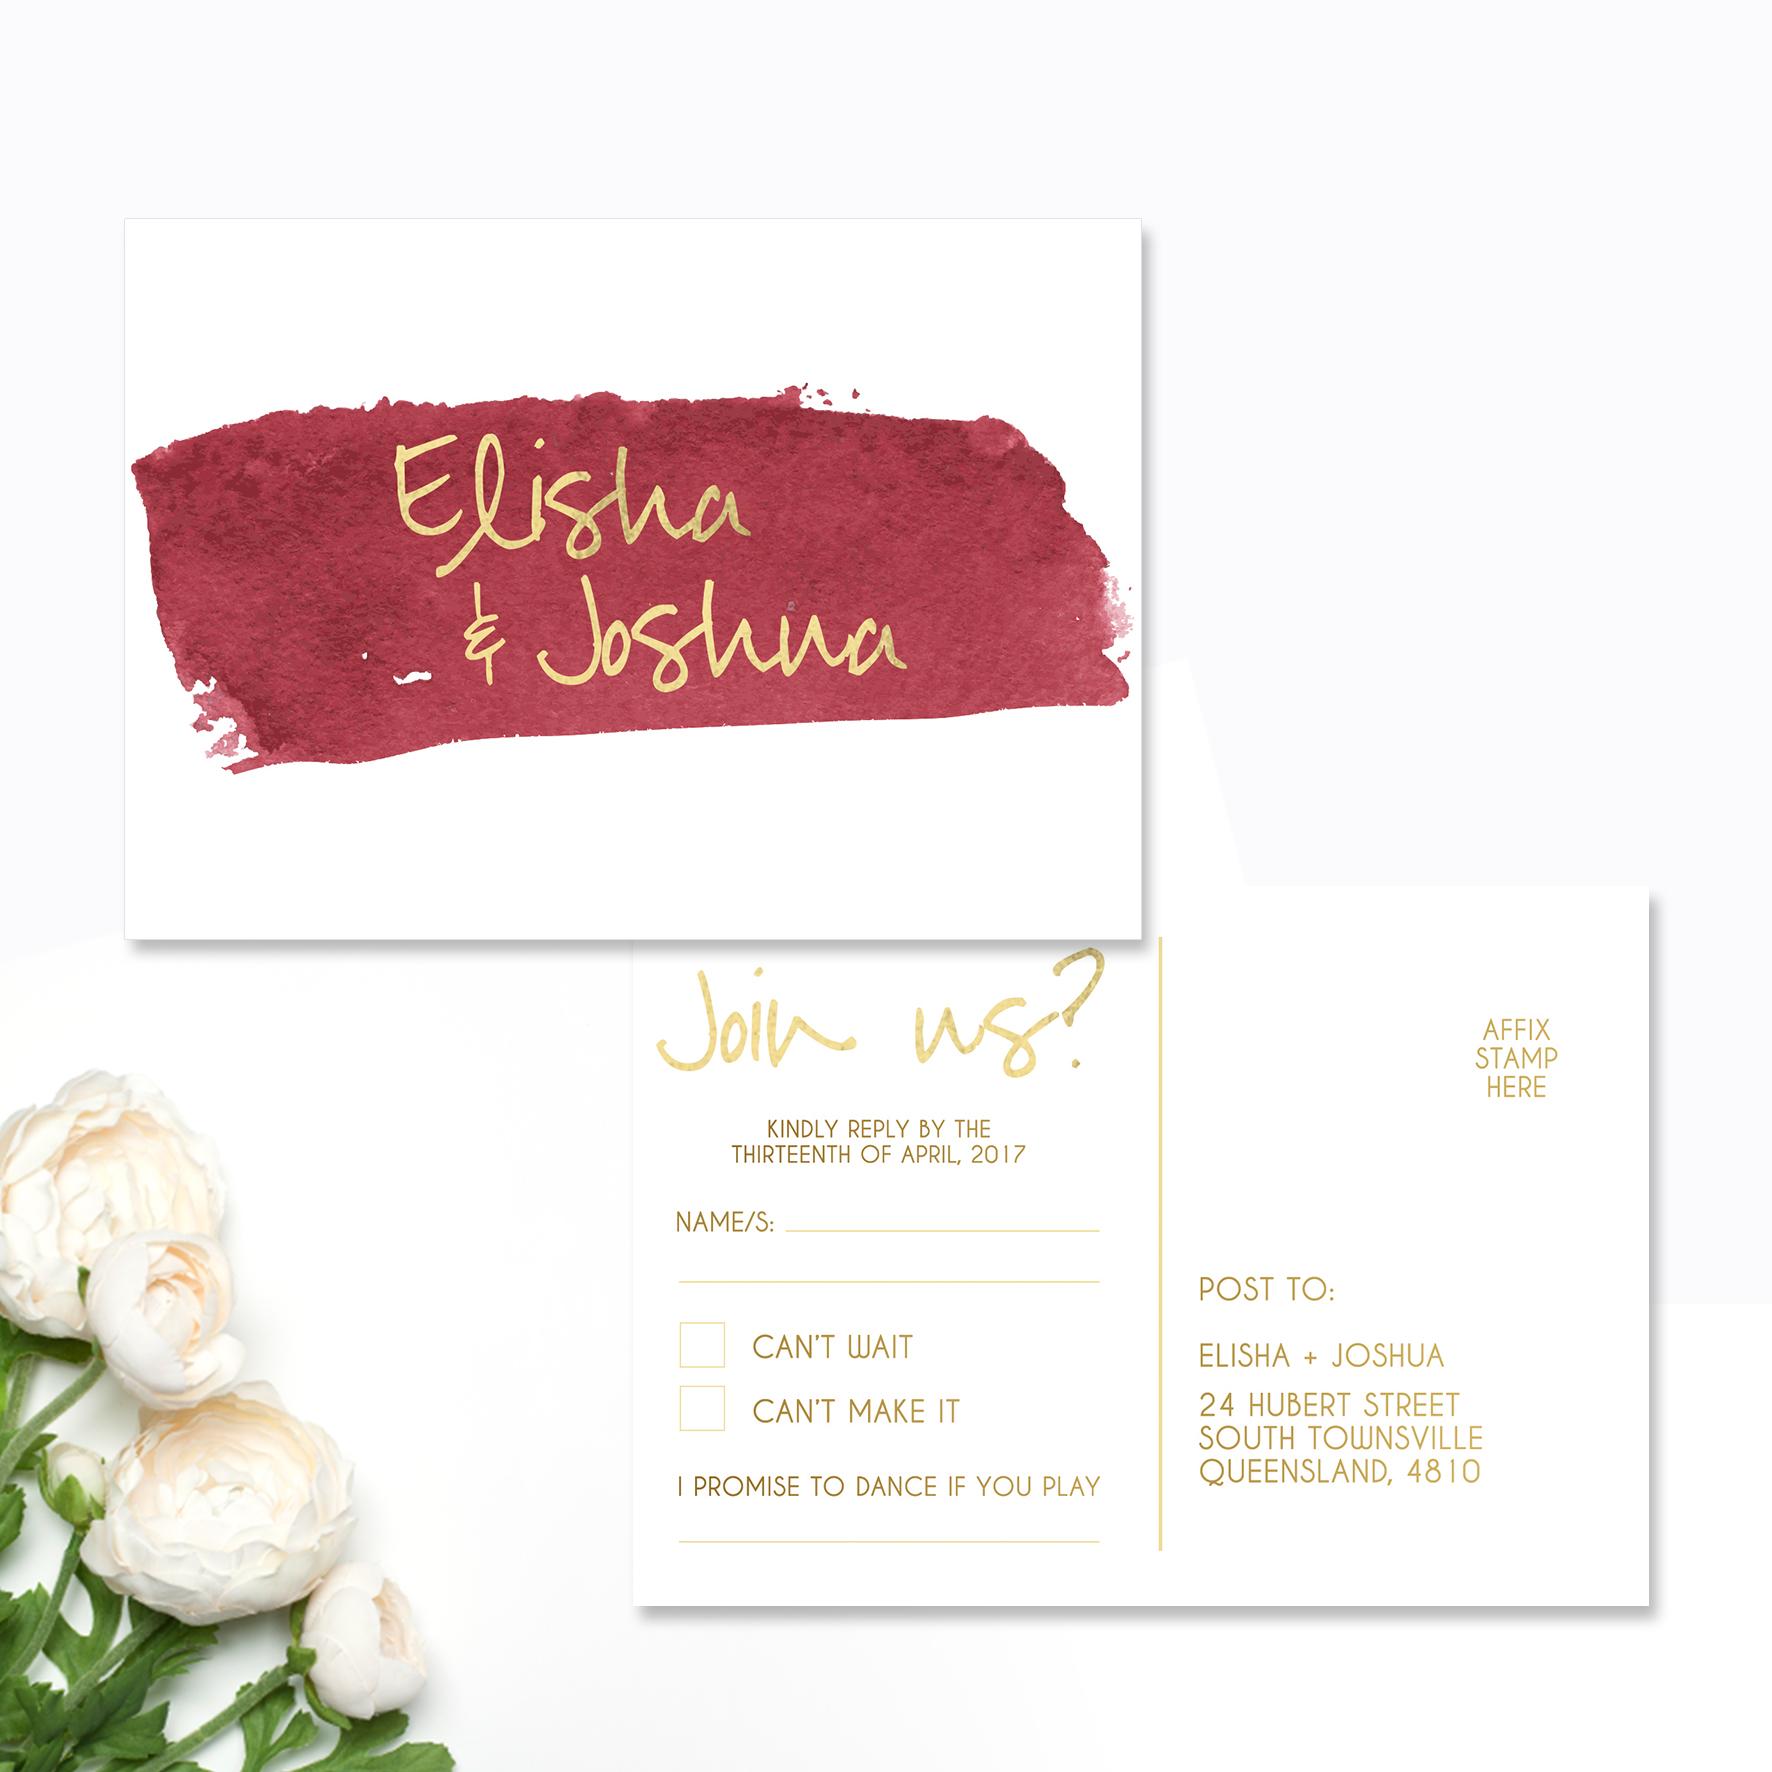 Elisha + Joshua Reply Card